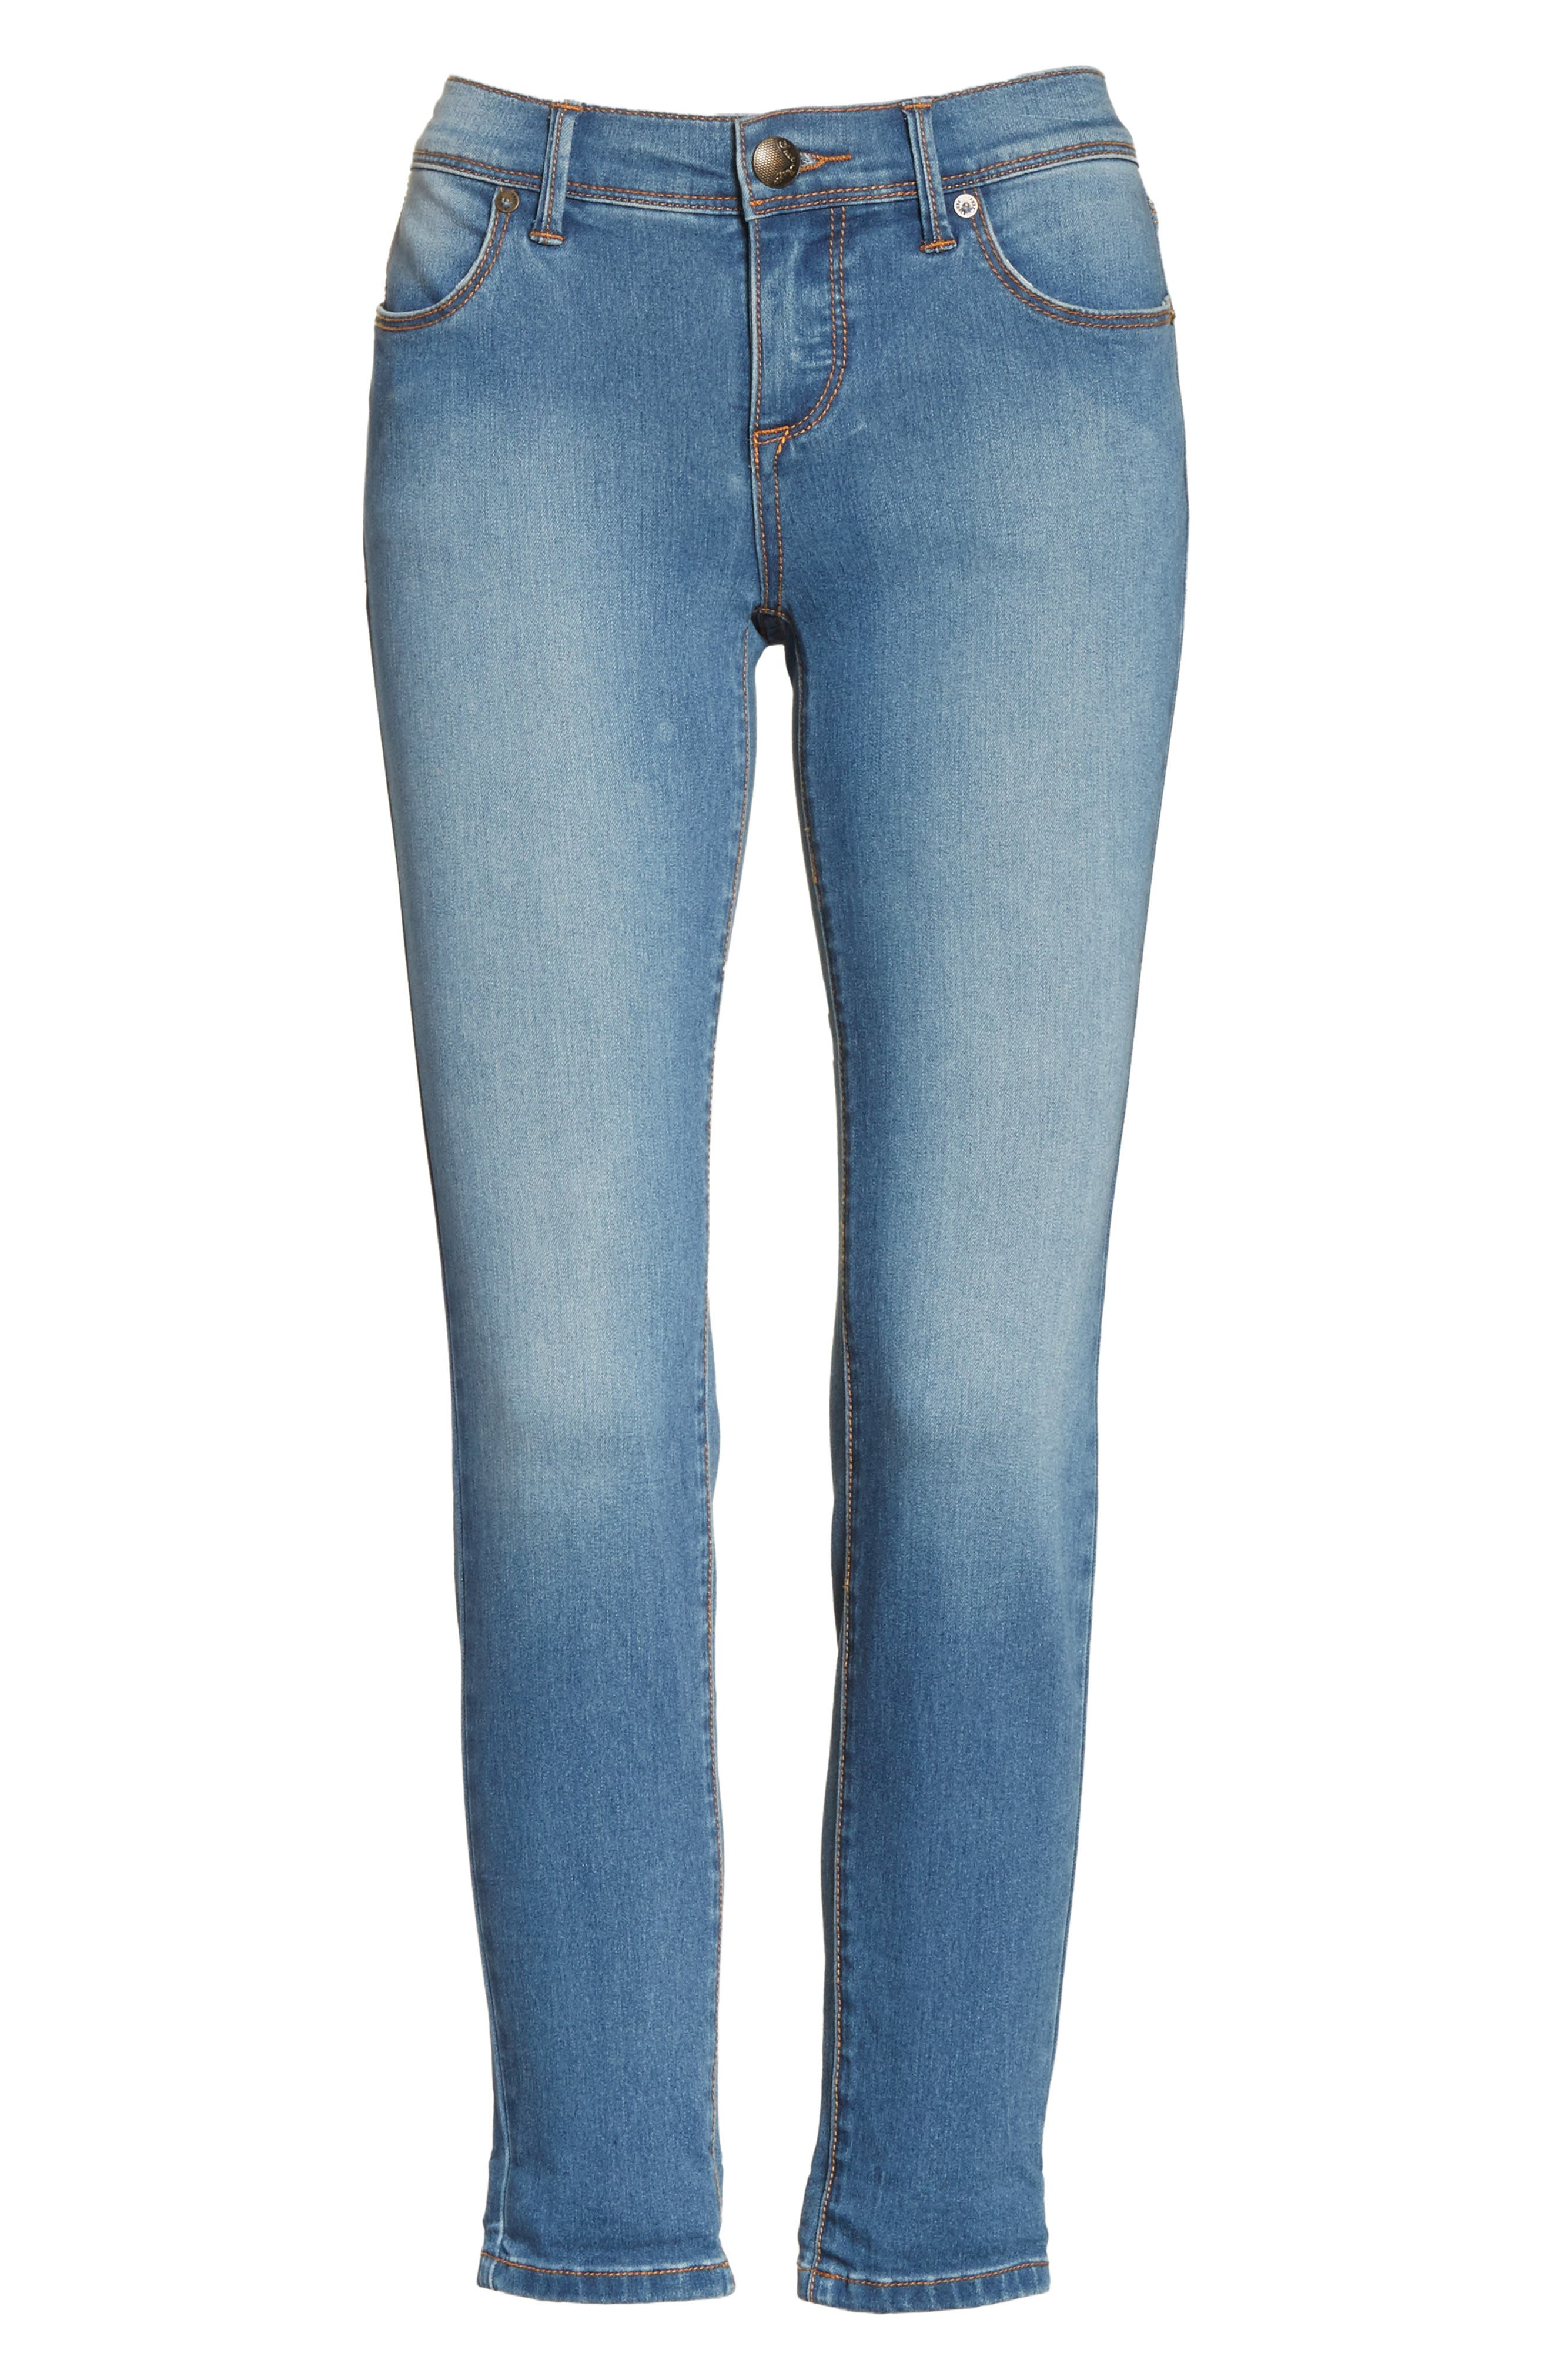 Gummy High Waist Jeans,                         Main,                         color, Light Denim